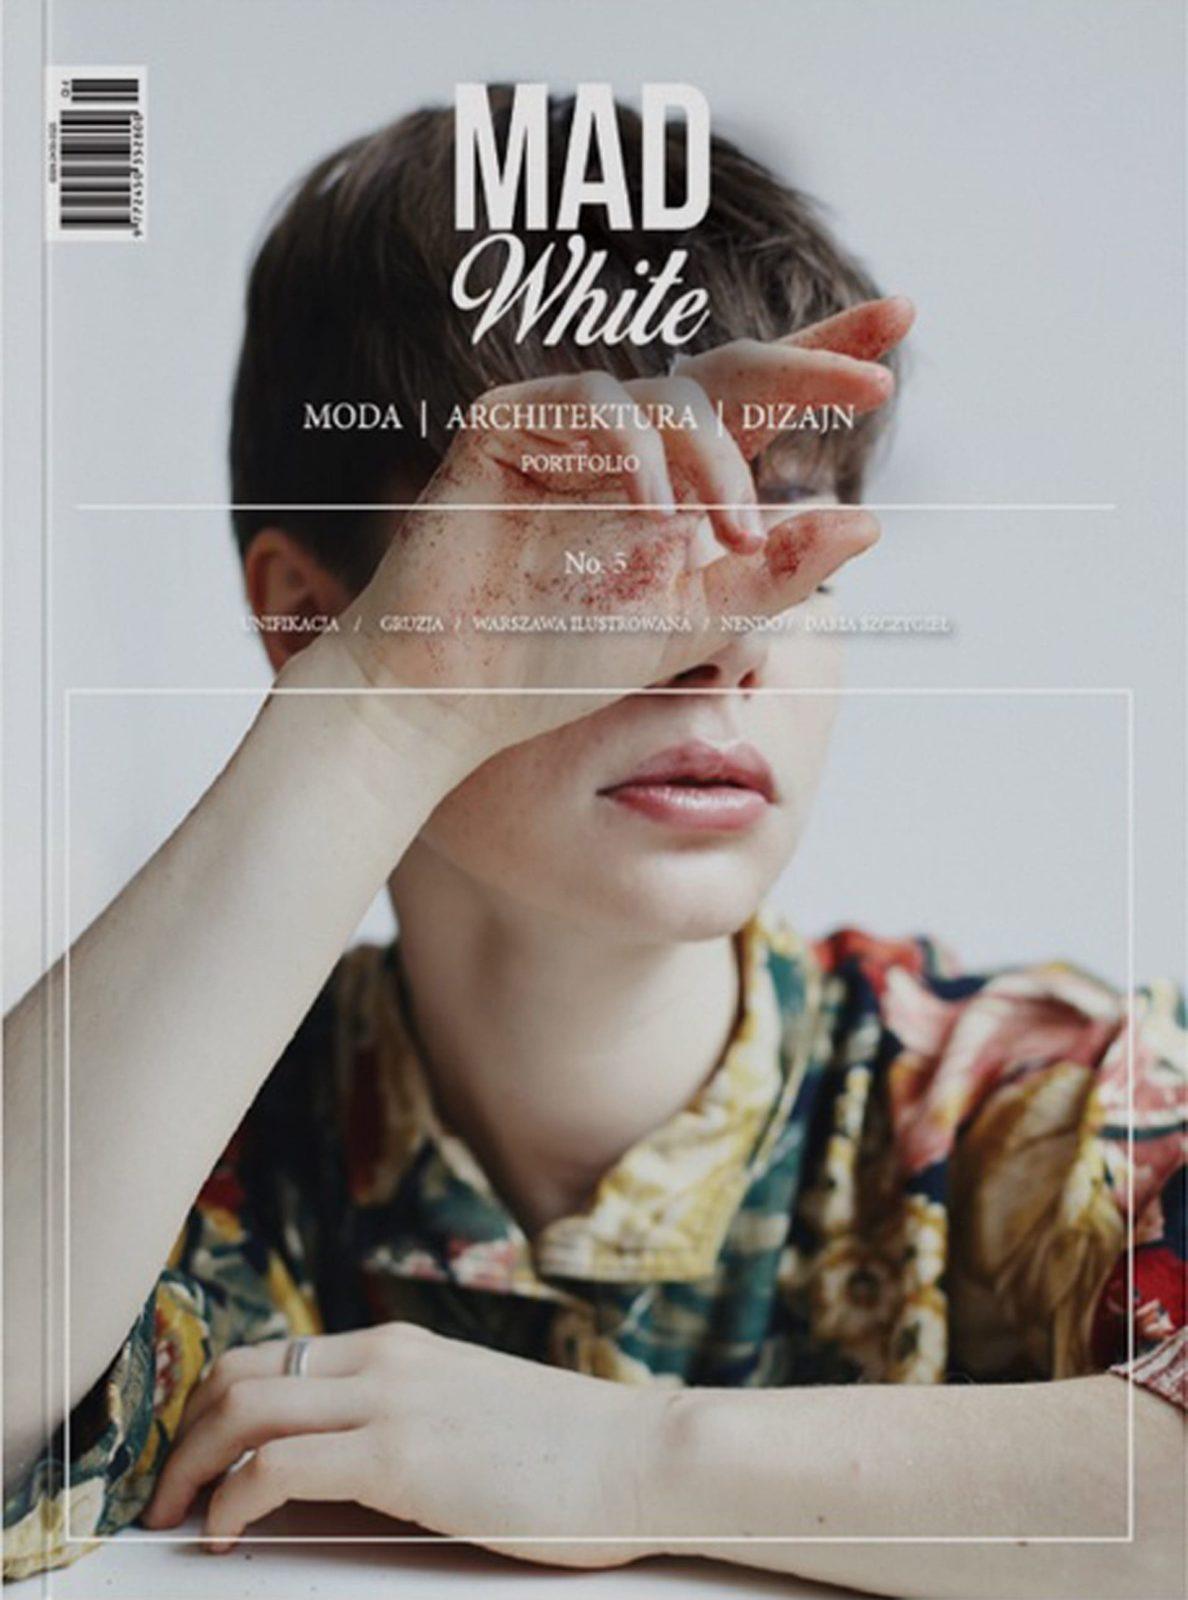 whiteMAD3B